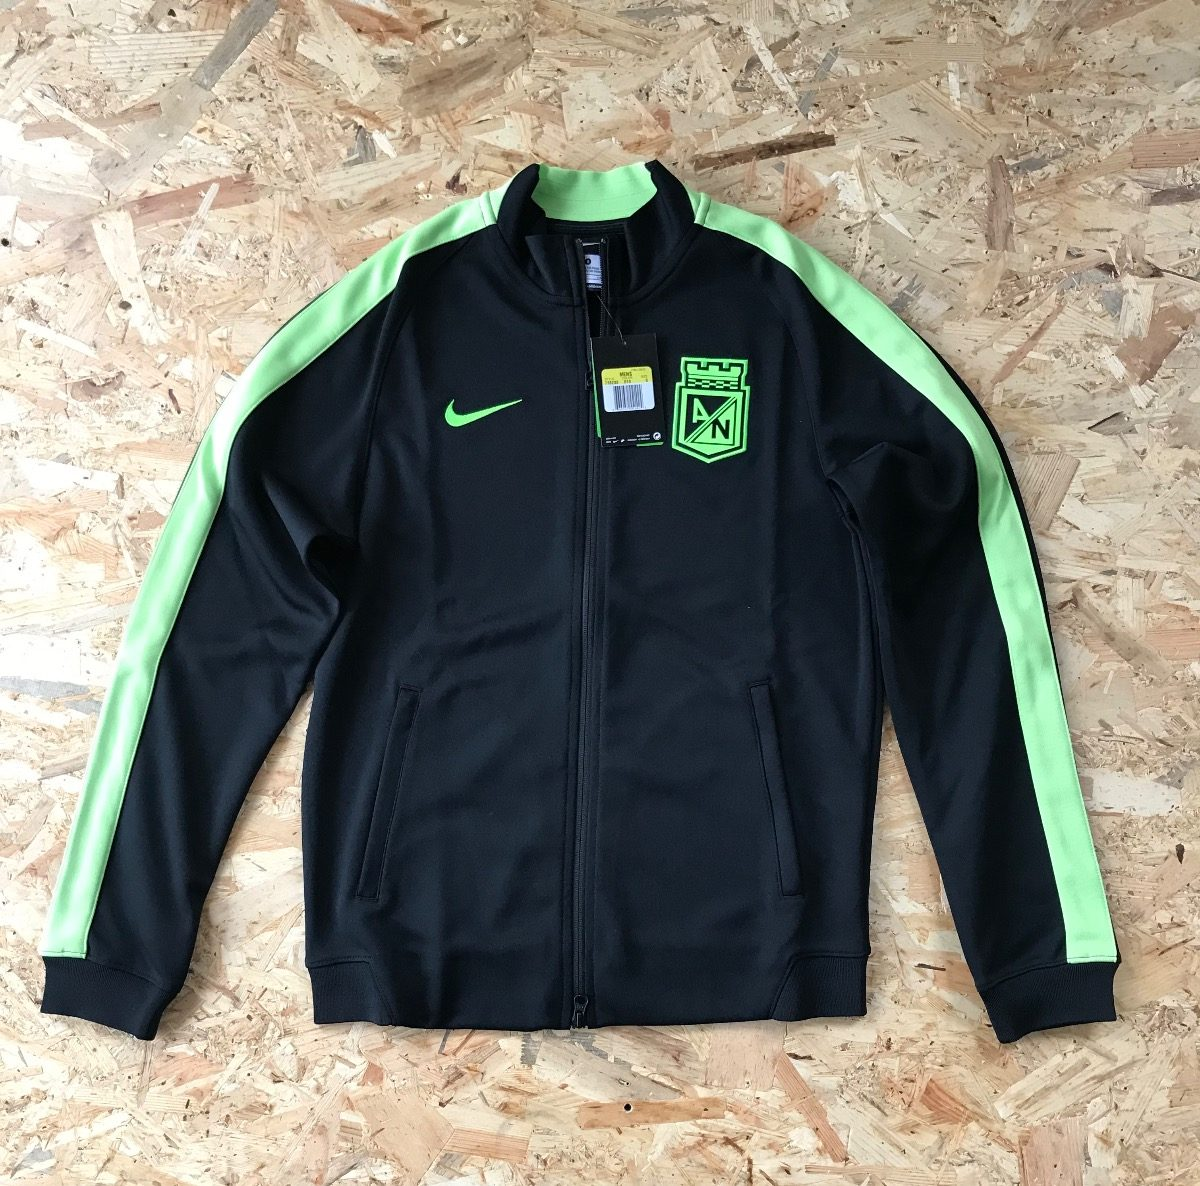 010Cargando Nike Chaqueta 716233 Zoom Atletico Nacional tBordCsQxh